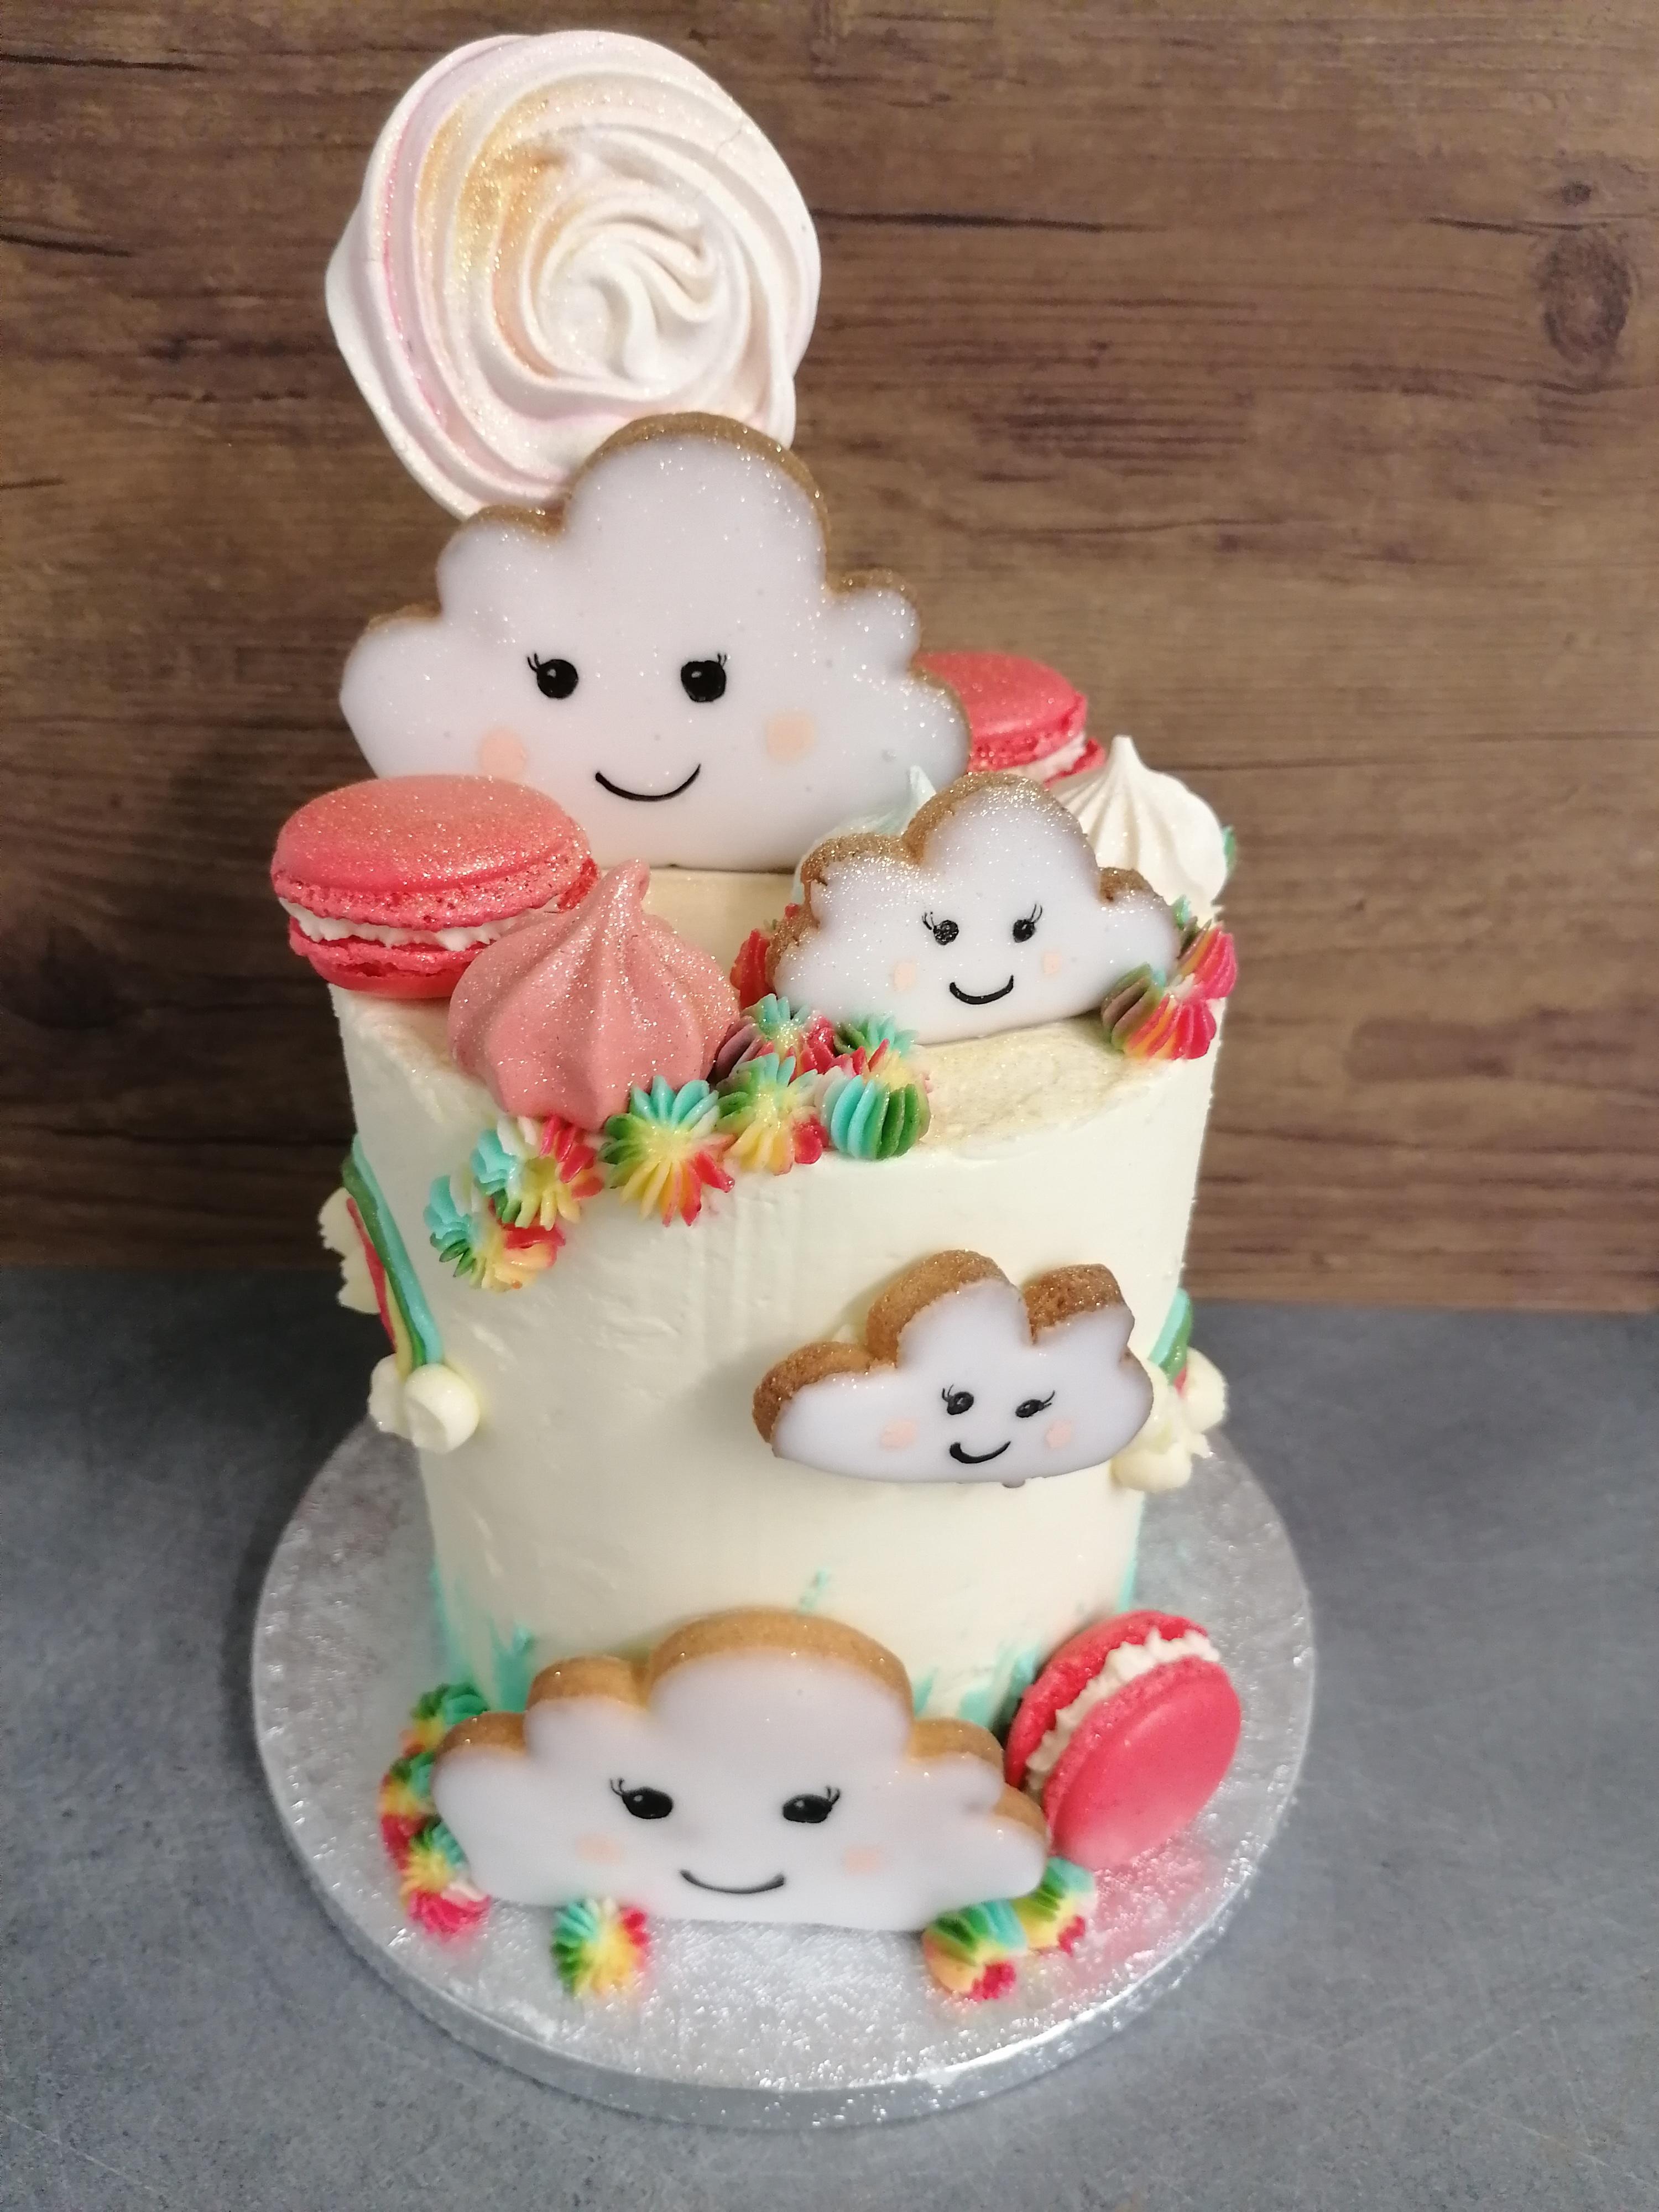 Jungle Thé pâtisserie layer cake